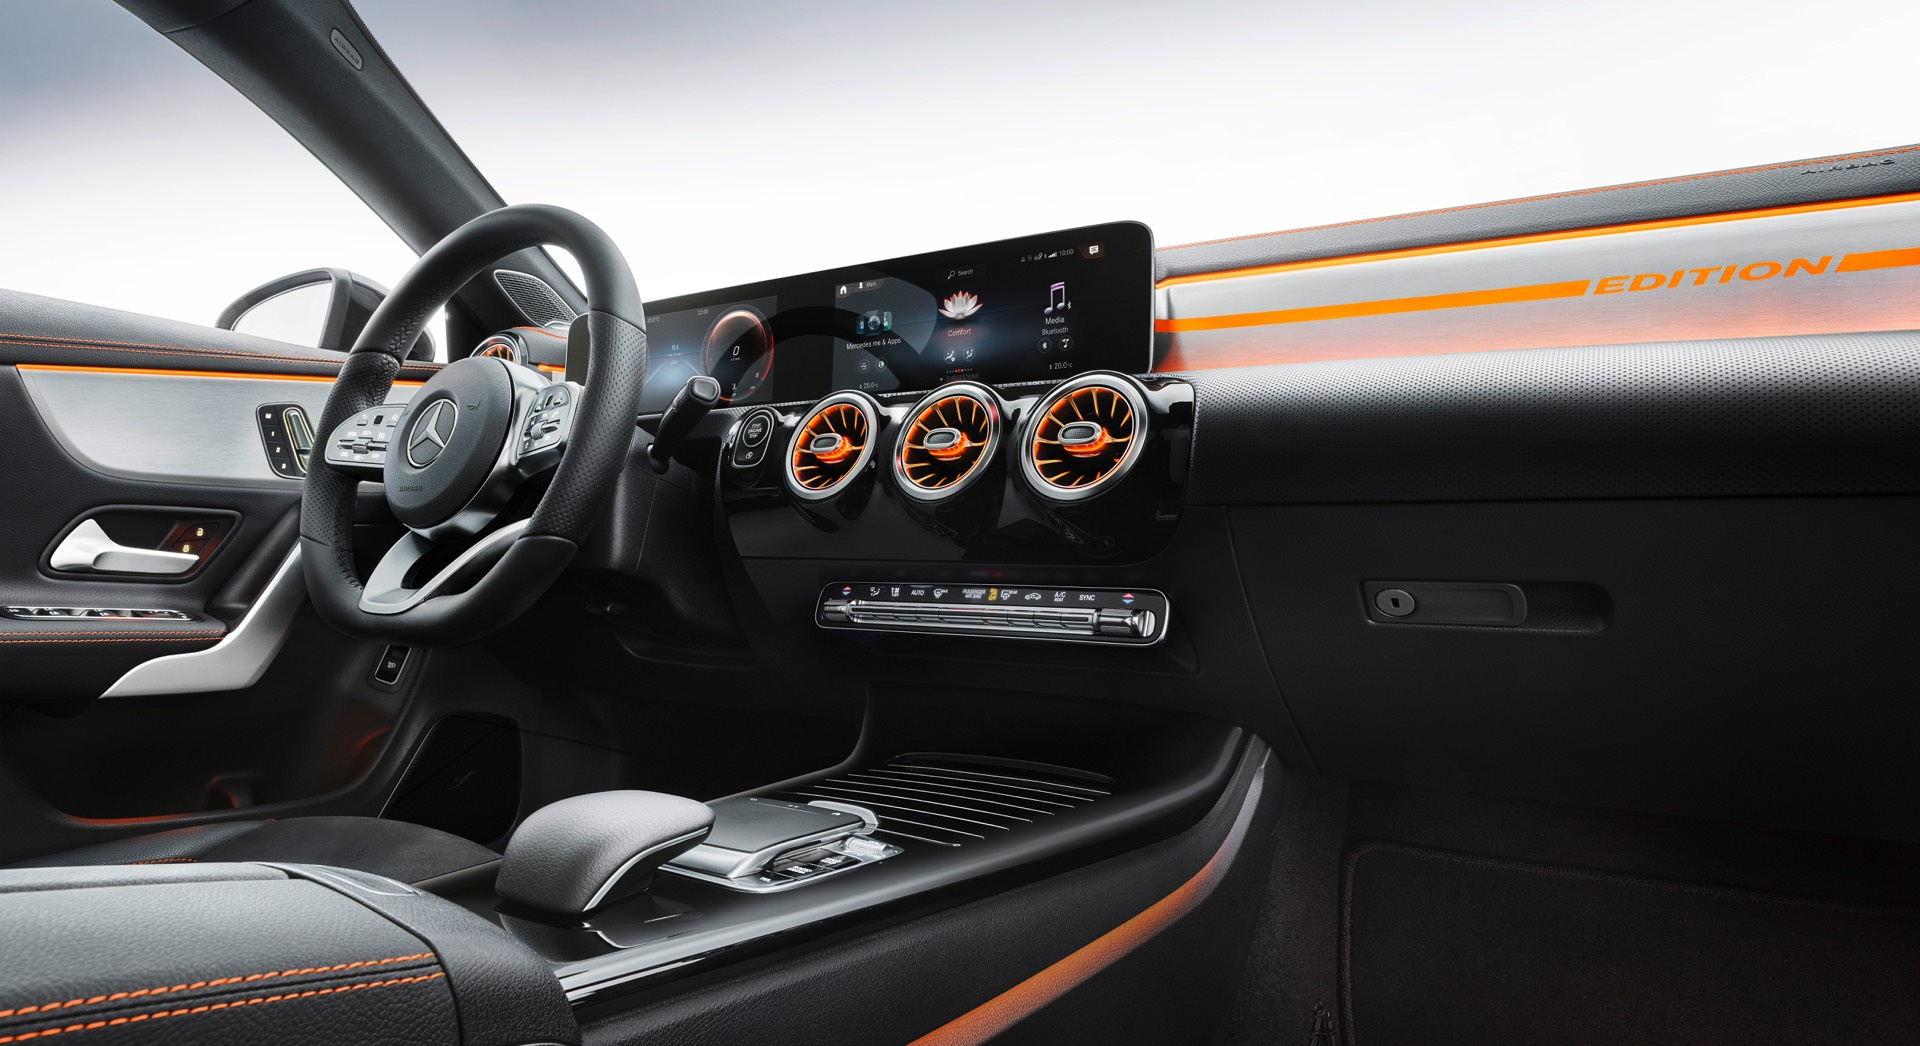 2019 Mercedes-Benz CLA Class Centre Console